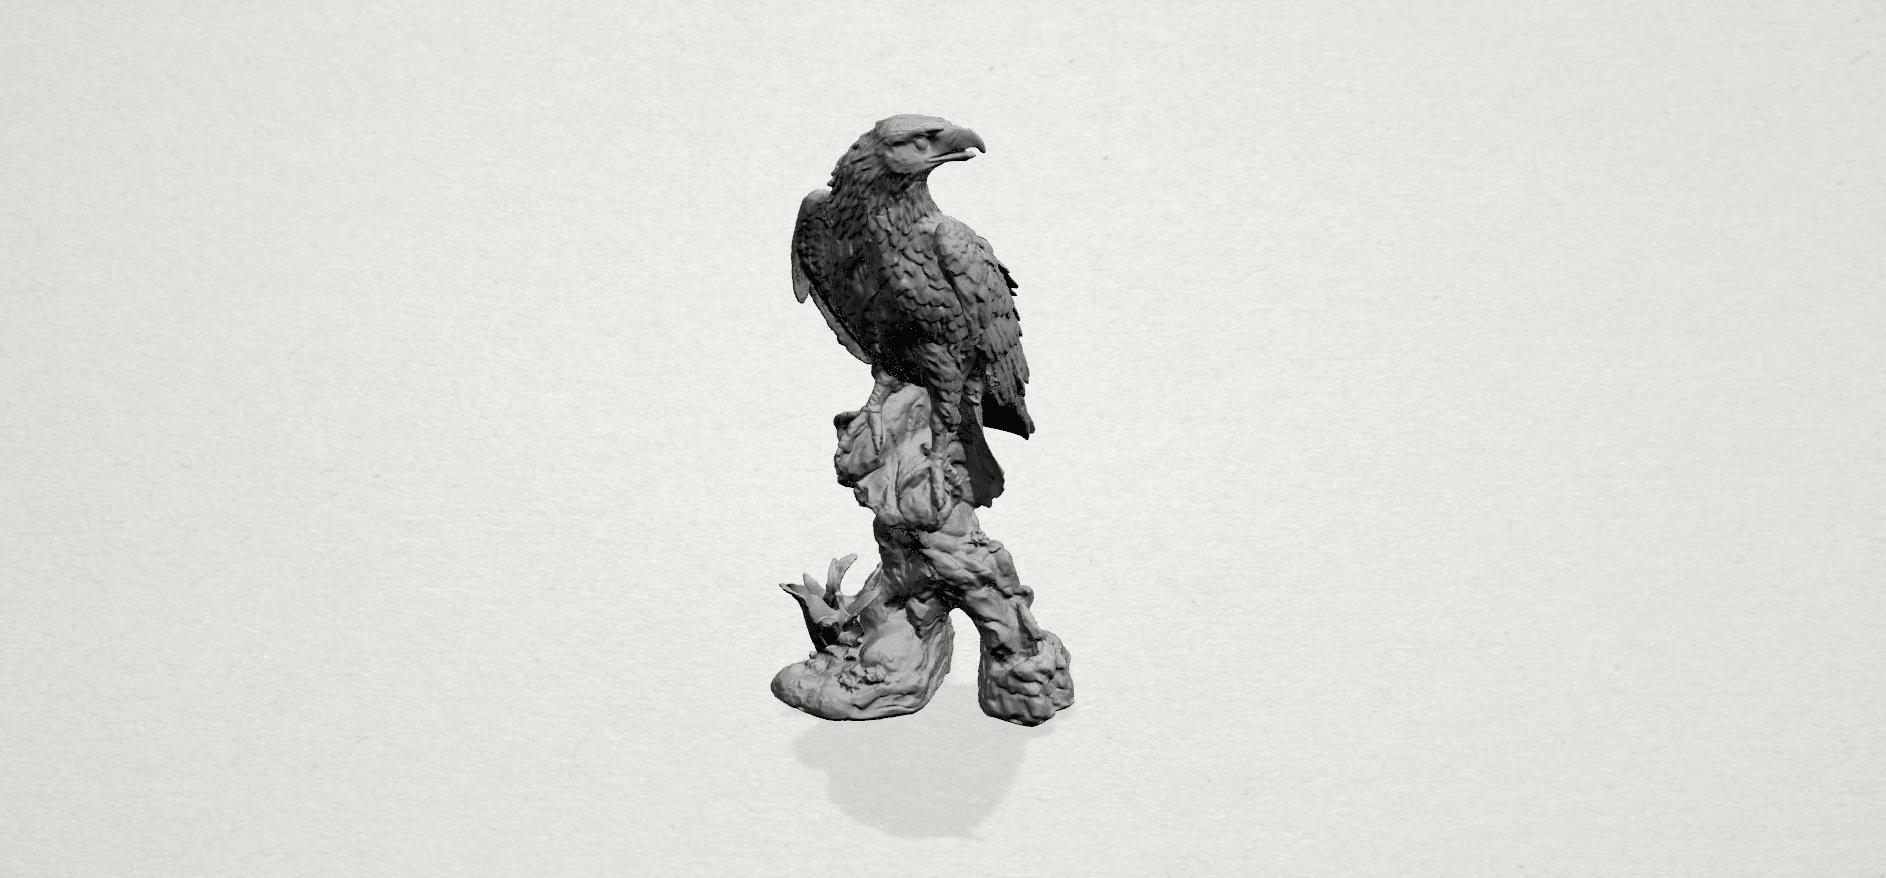 eagle - A03.png Download free STL file Eagle 01 • 3D printing design, GeorgesNikkei